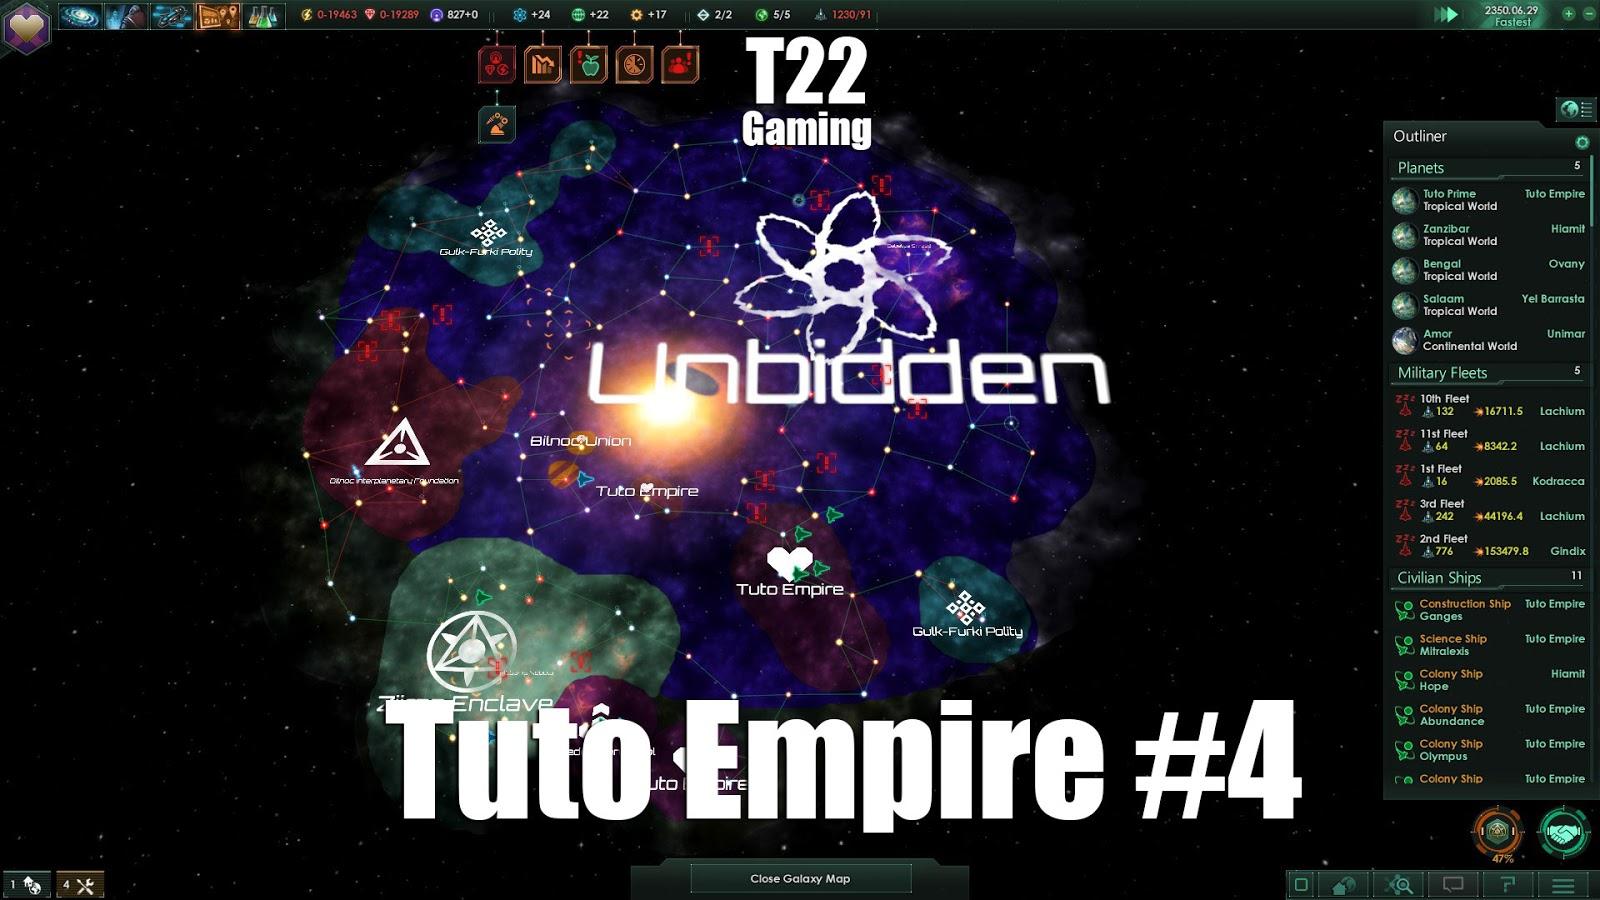 T22 Gaming: Stellaris: Tuto Empire #4